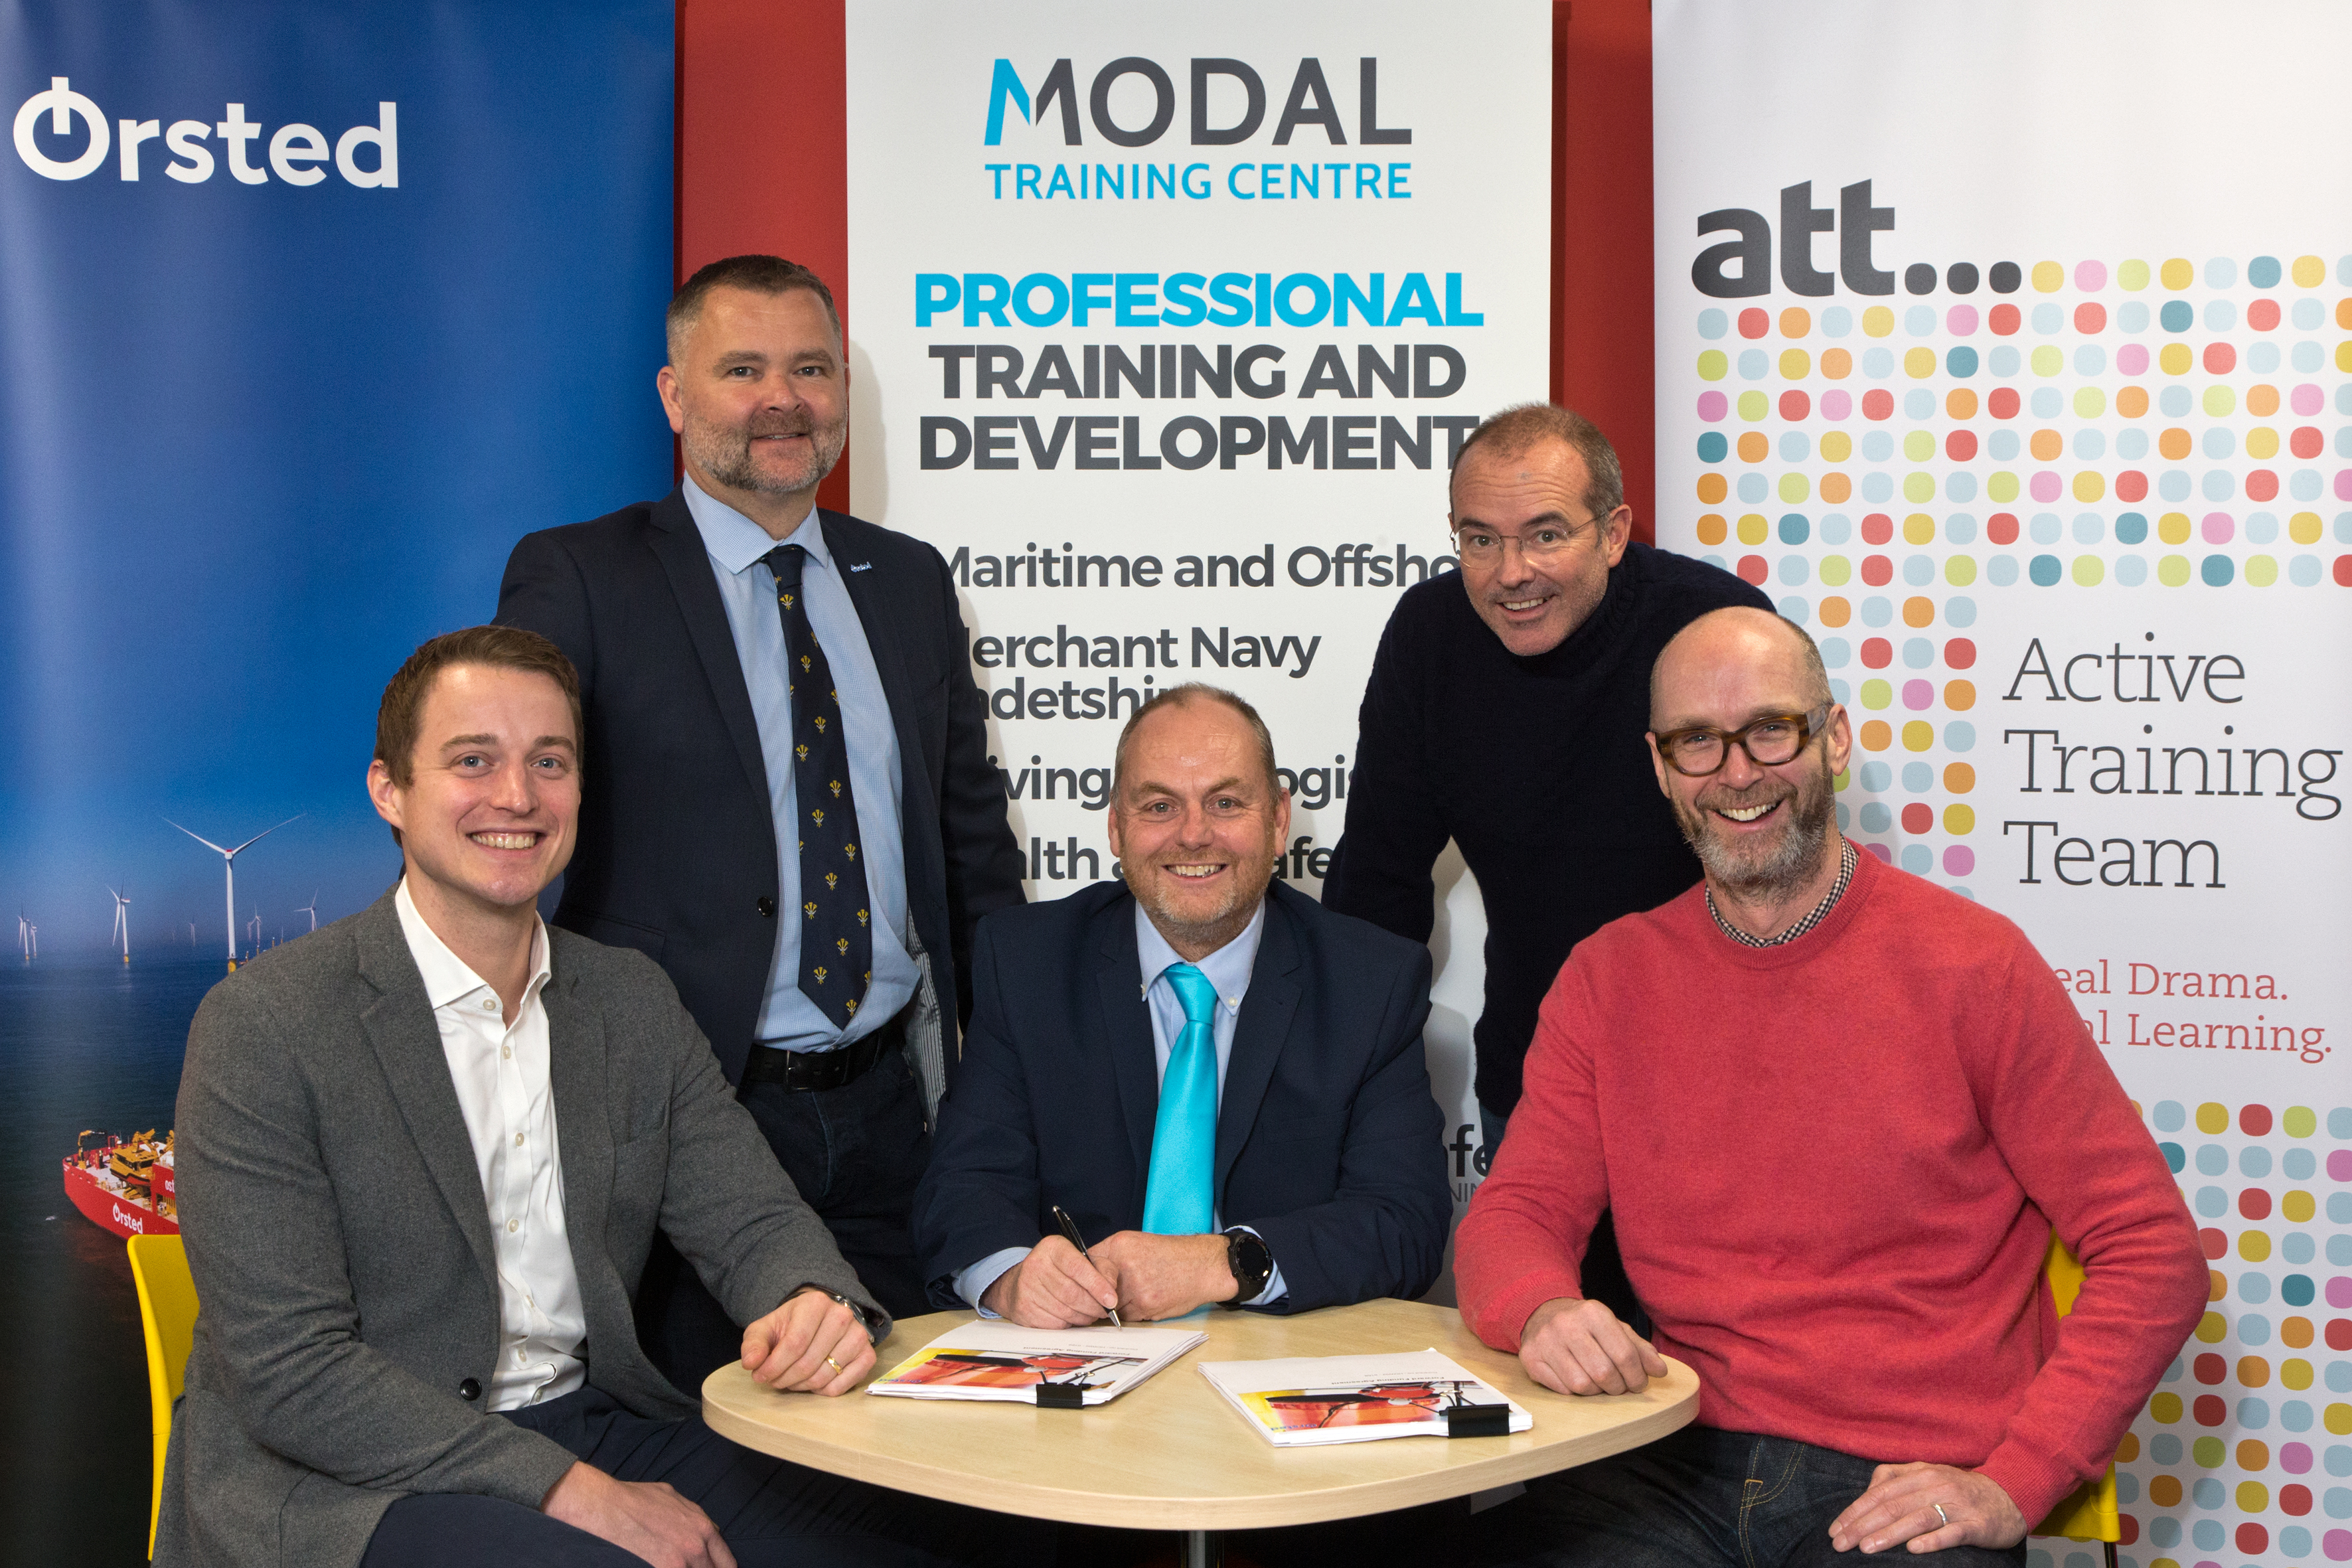 Orsted-ATT-ModalTrainingCenre-Collaboration